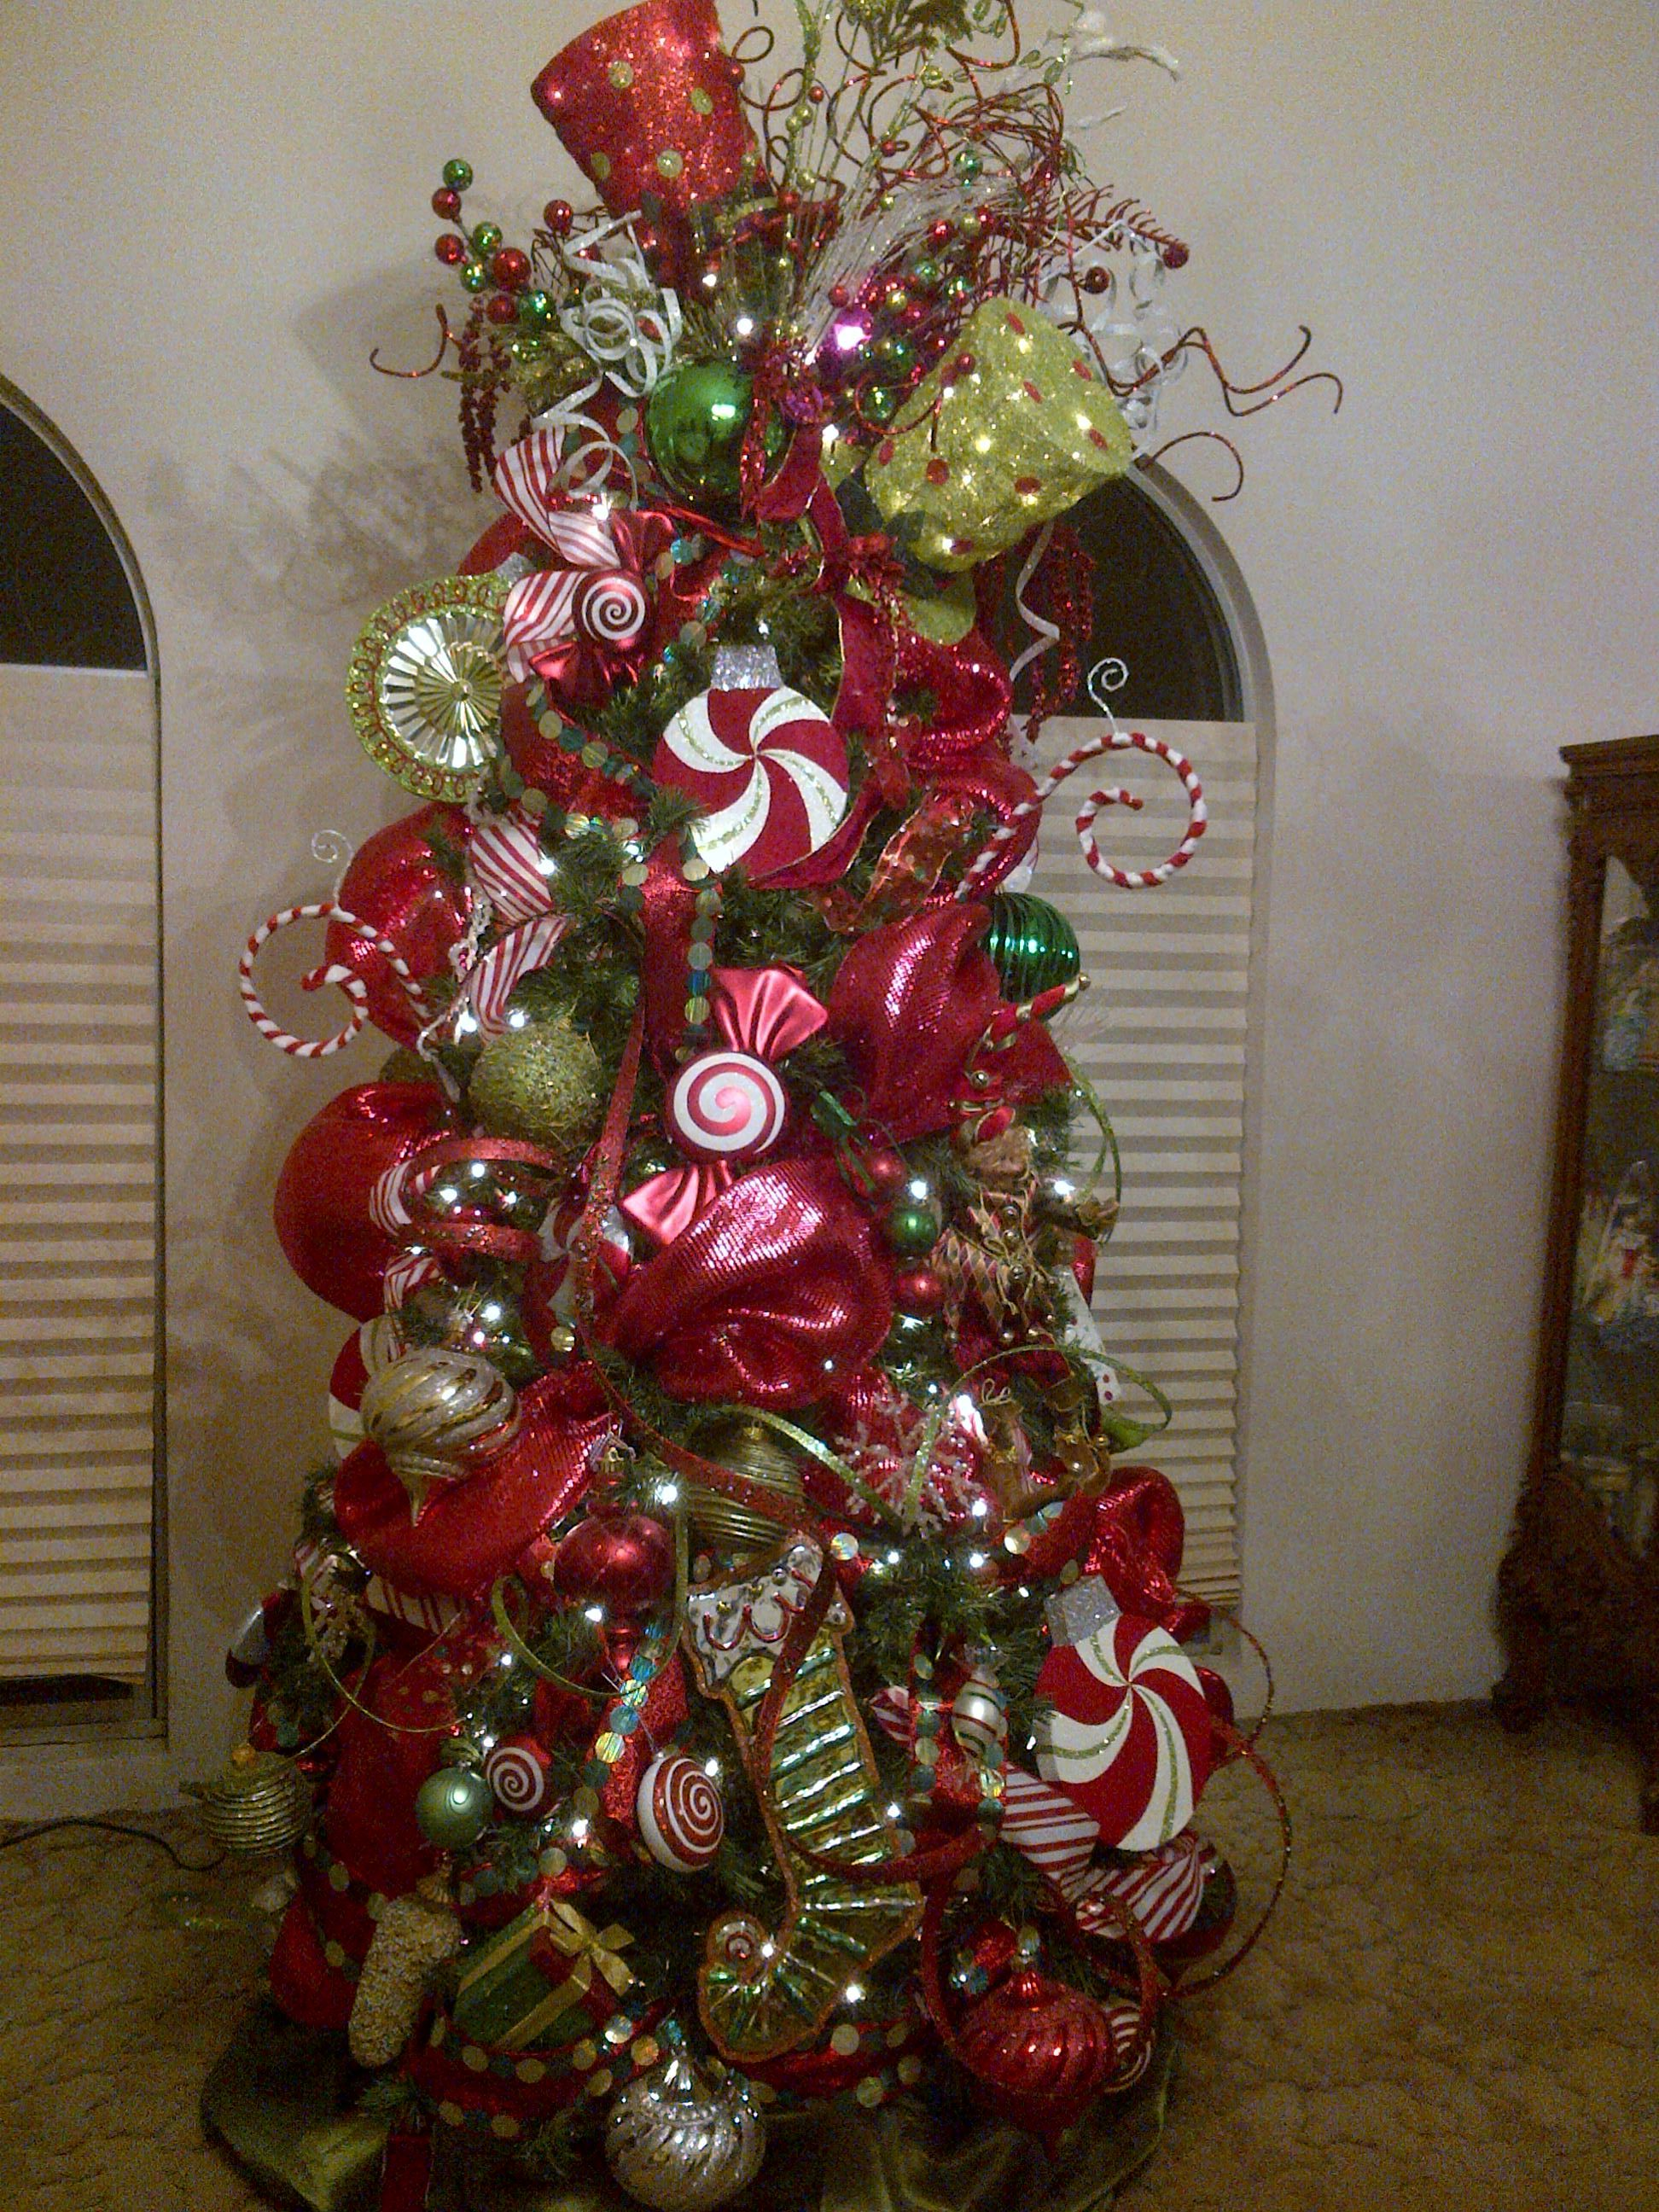 7c86532ce31 arbolito moderno! sombreros. arbolito moderno! sombreros Pino De Navidad  Blanco